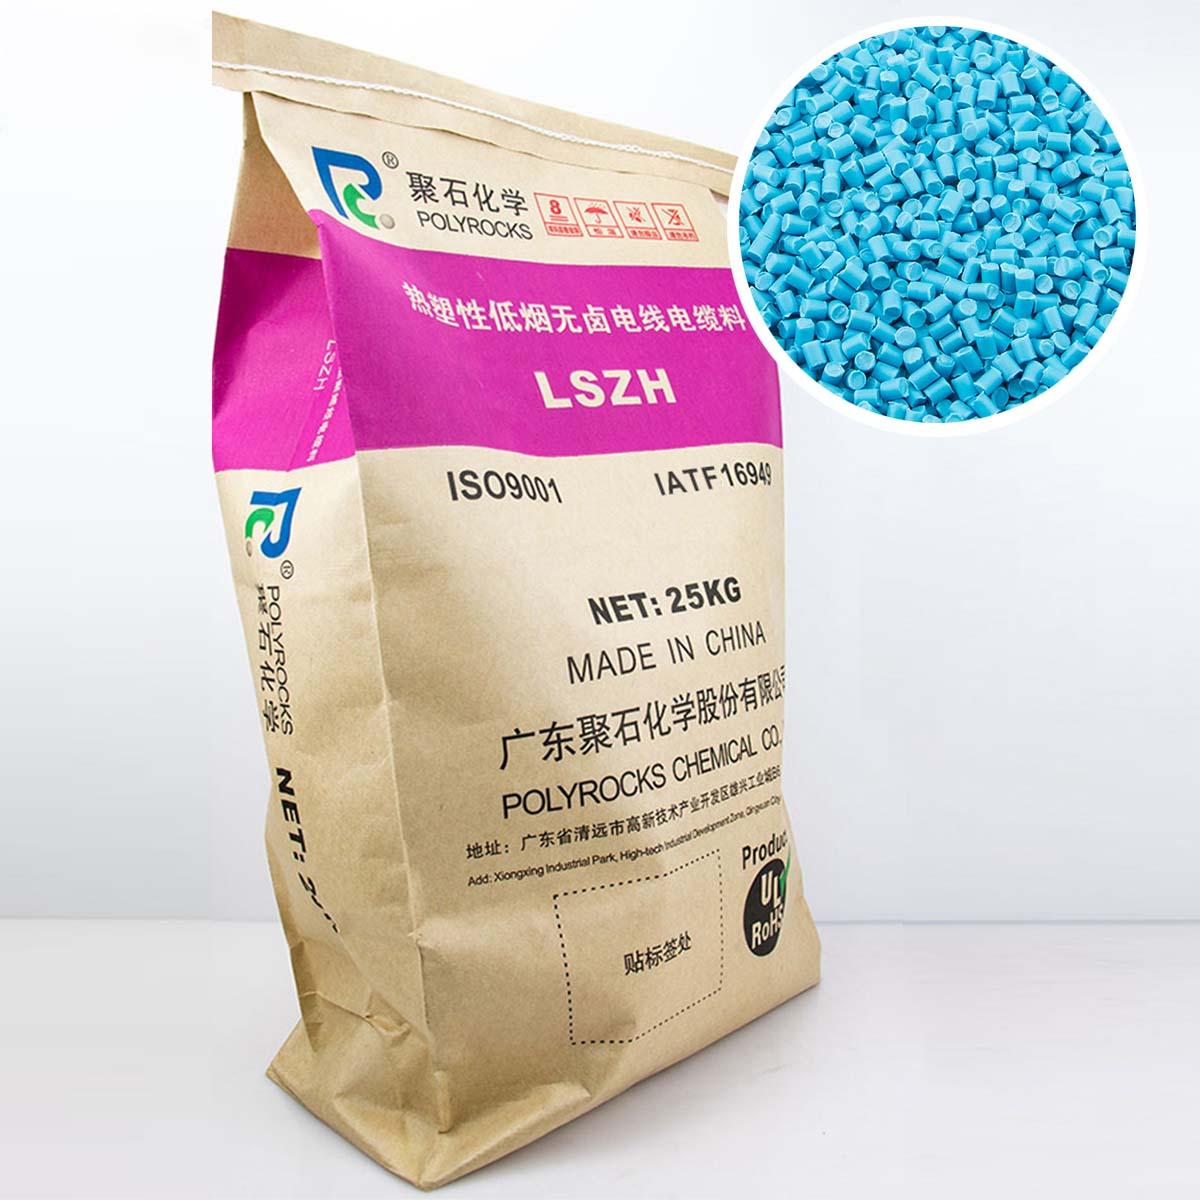 LSZH(蓝色粒子)